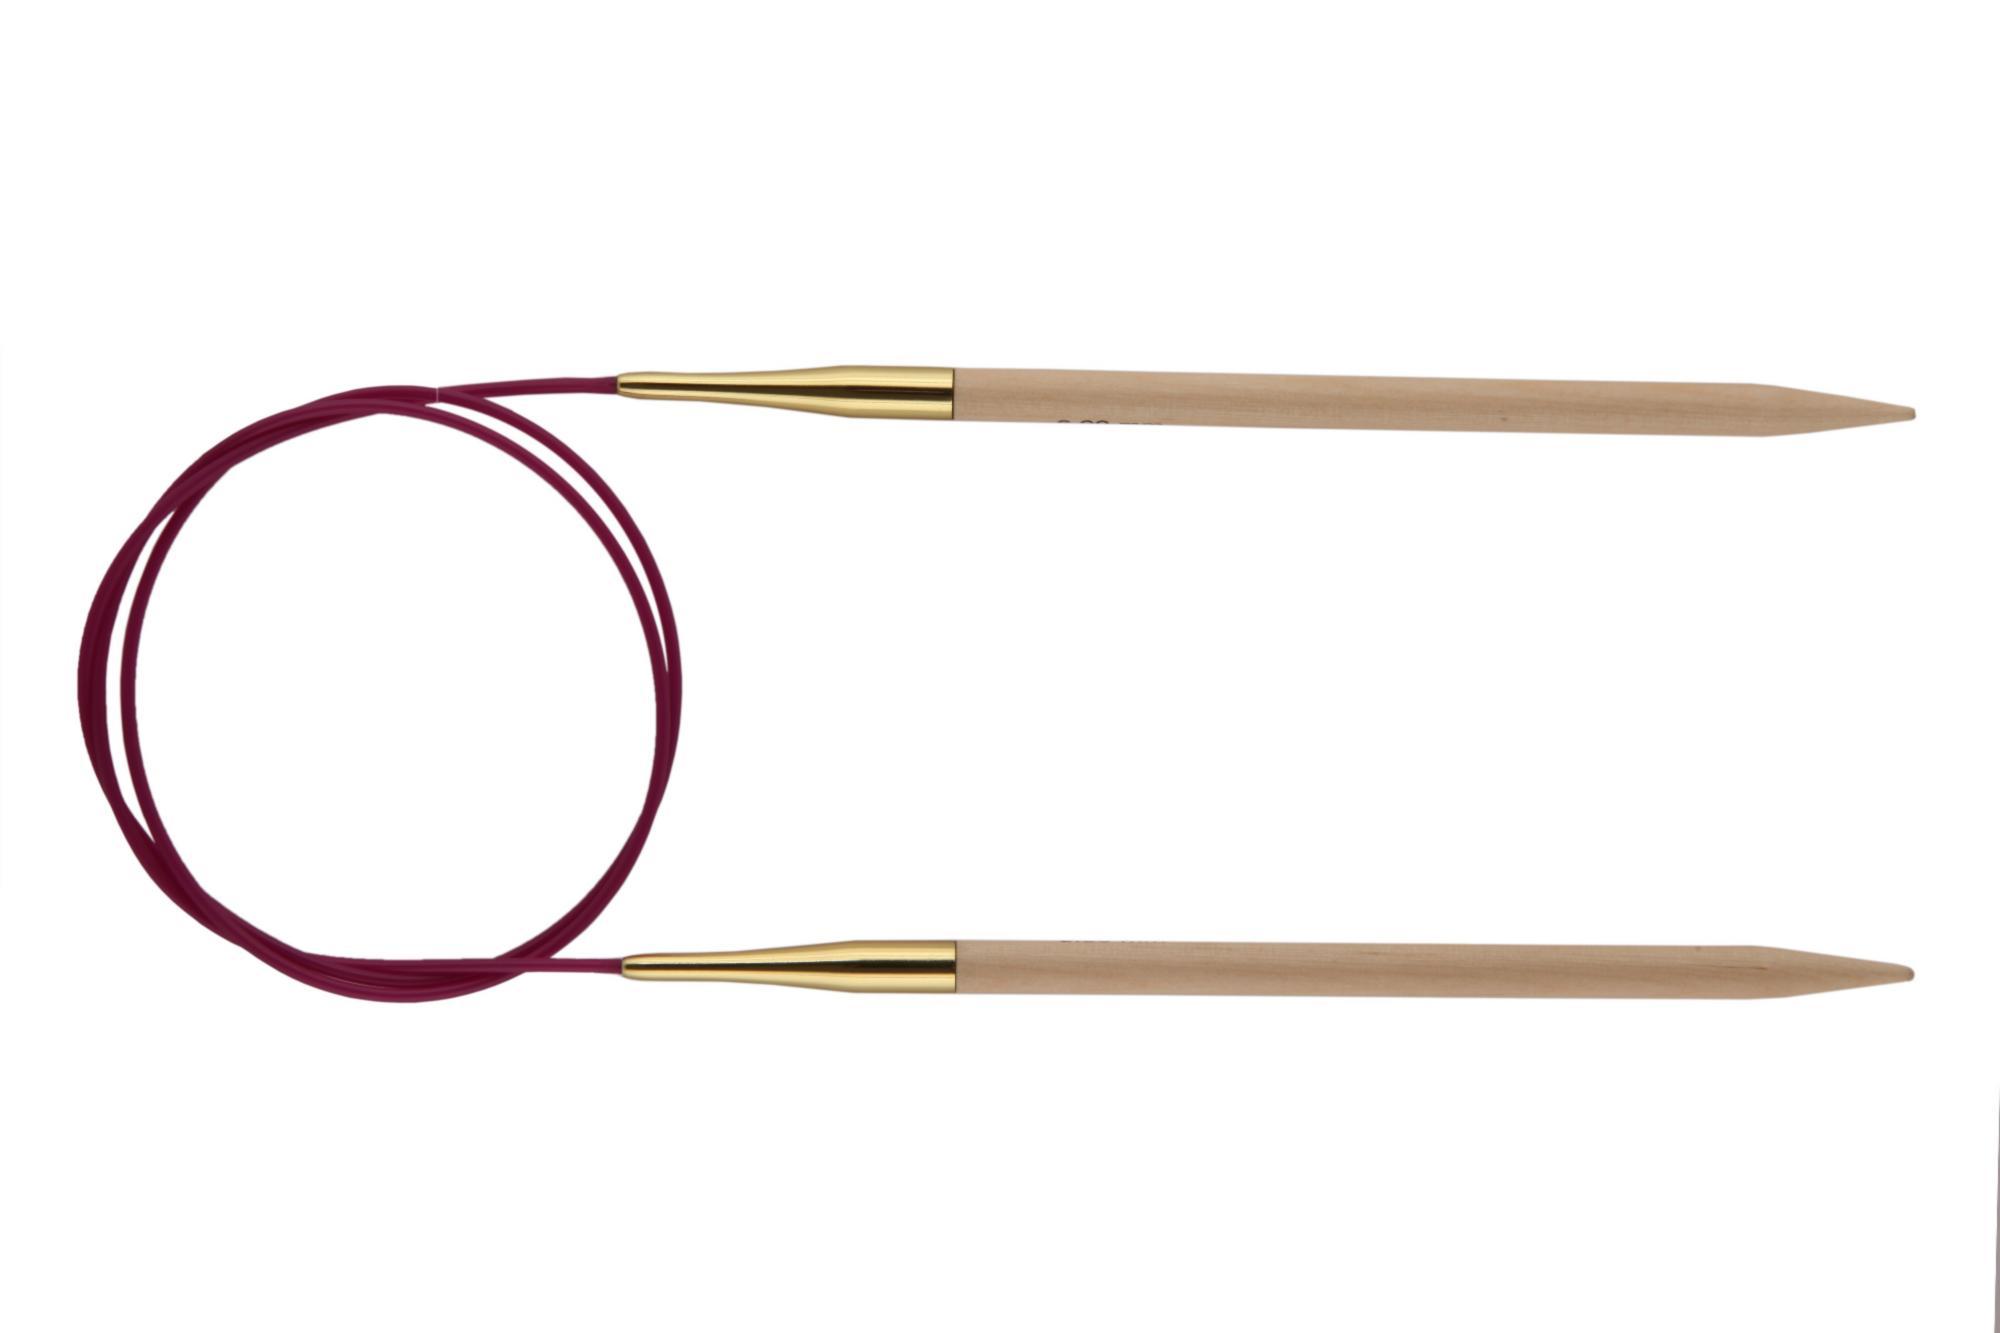 Спицы круговые 120 см Basix Birch Wood KnitPro, 35354, 7.00 мм